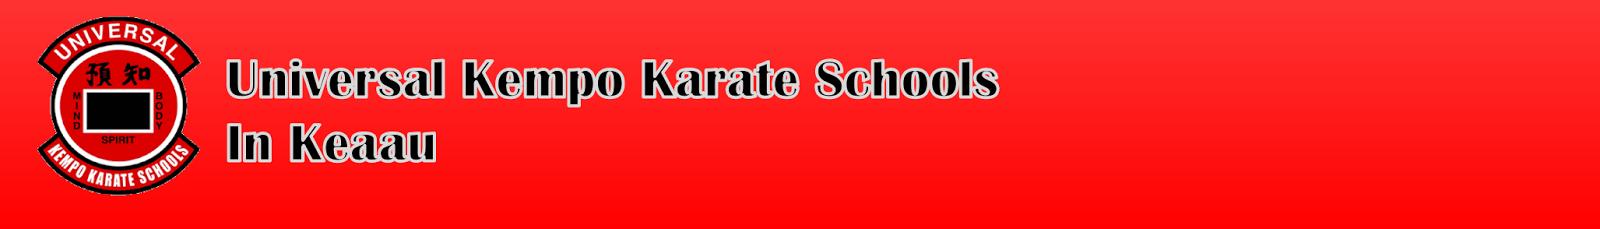 Universal Kempo Karate In Keaau